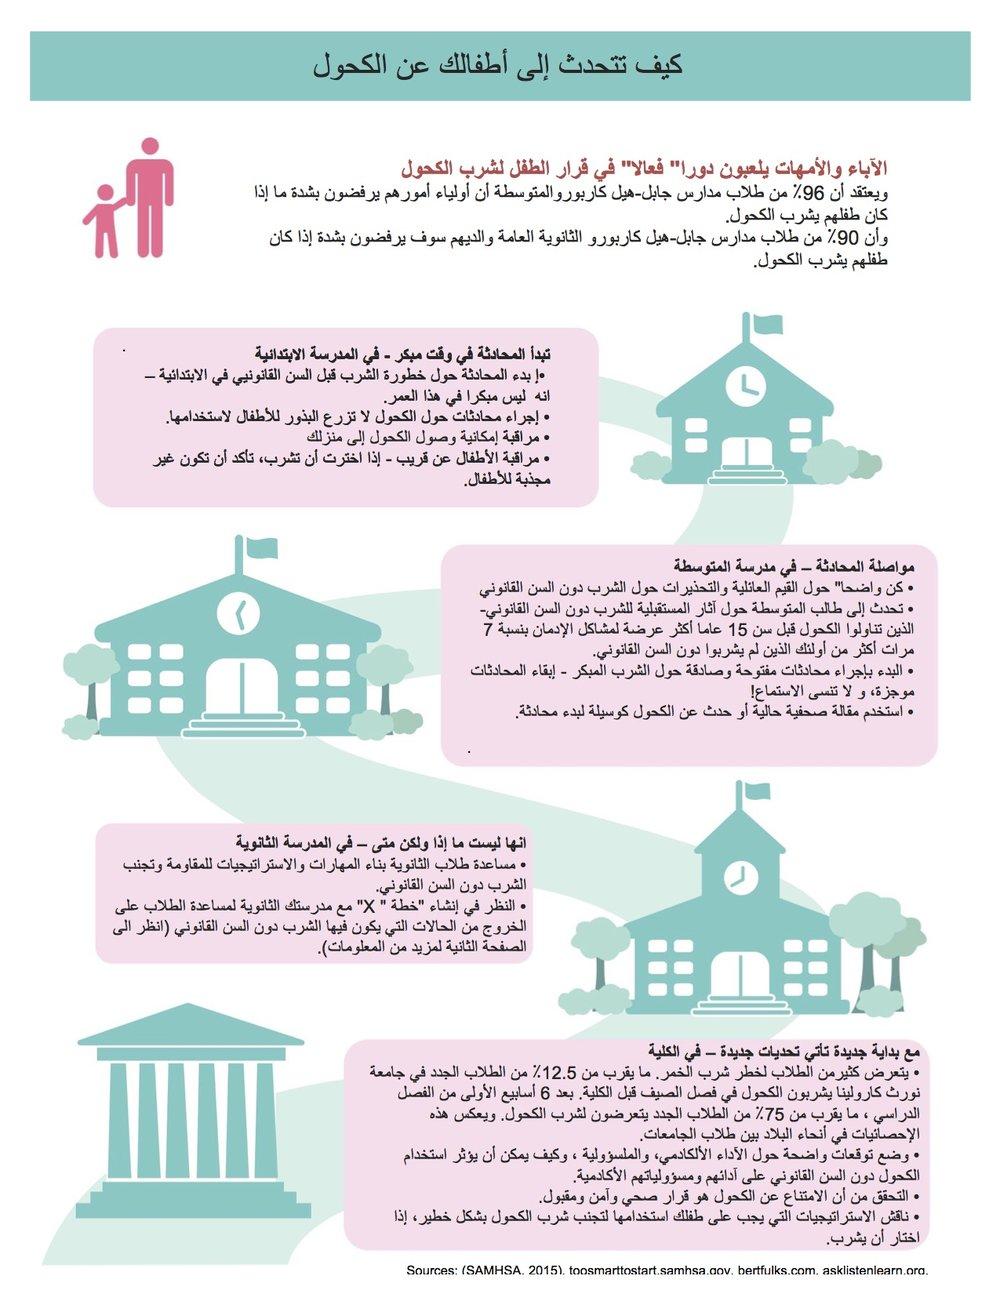 How Fact Sheet_Arabic1.jpg